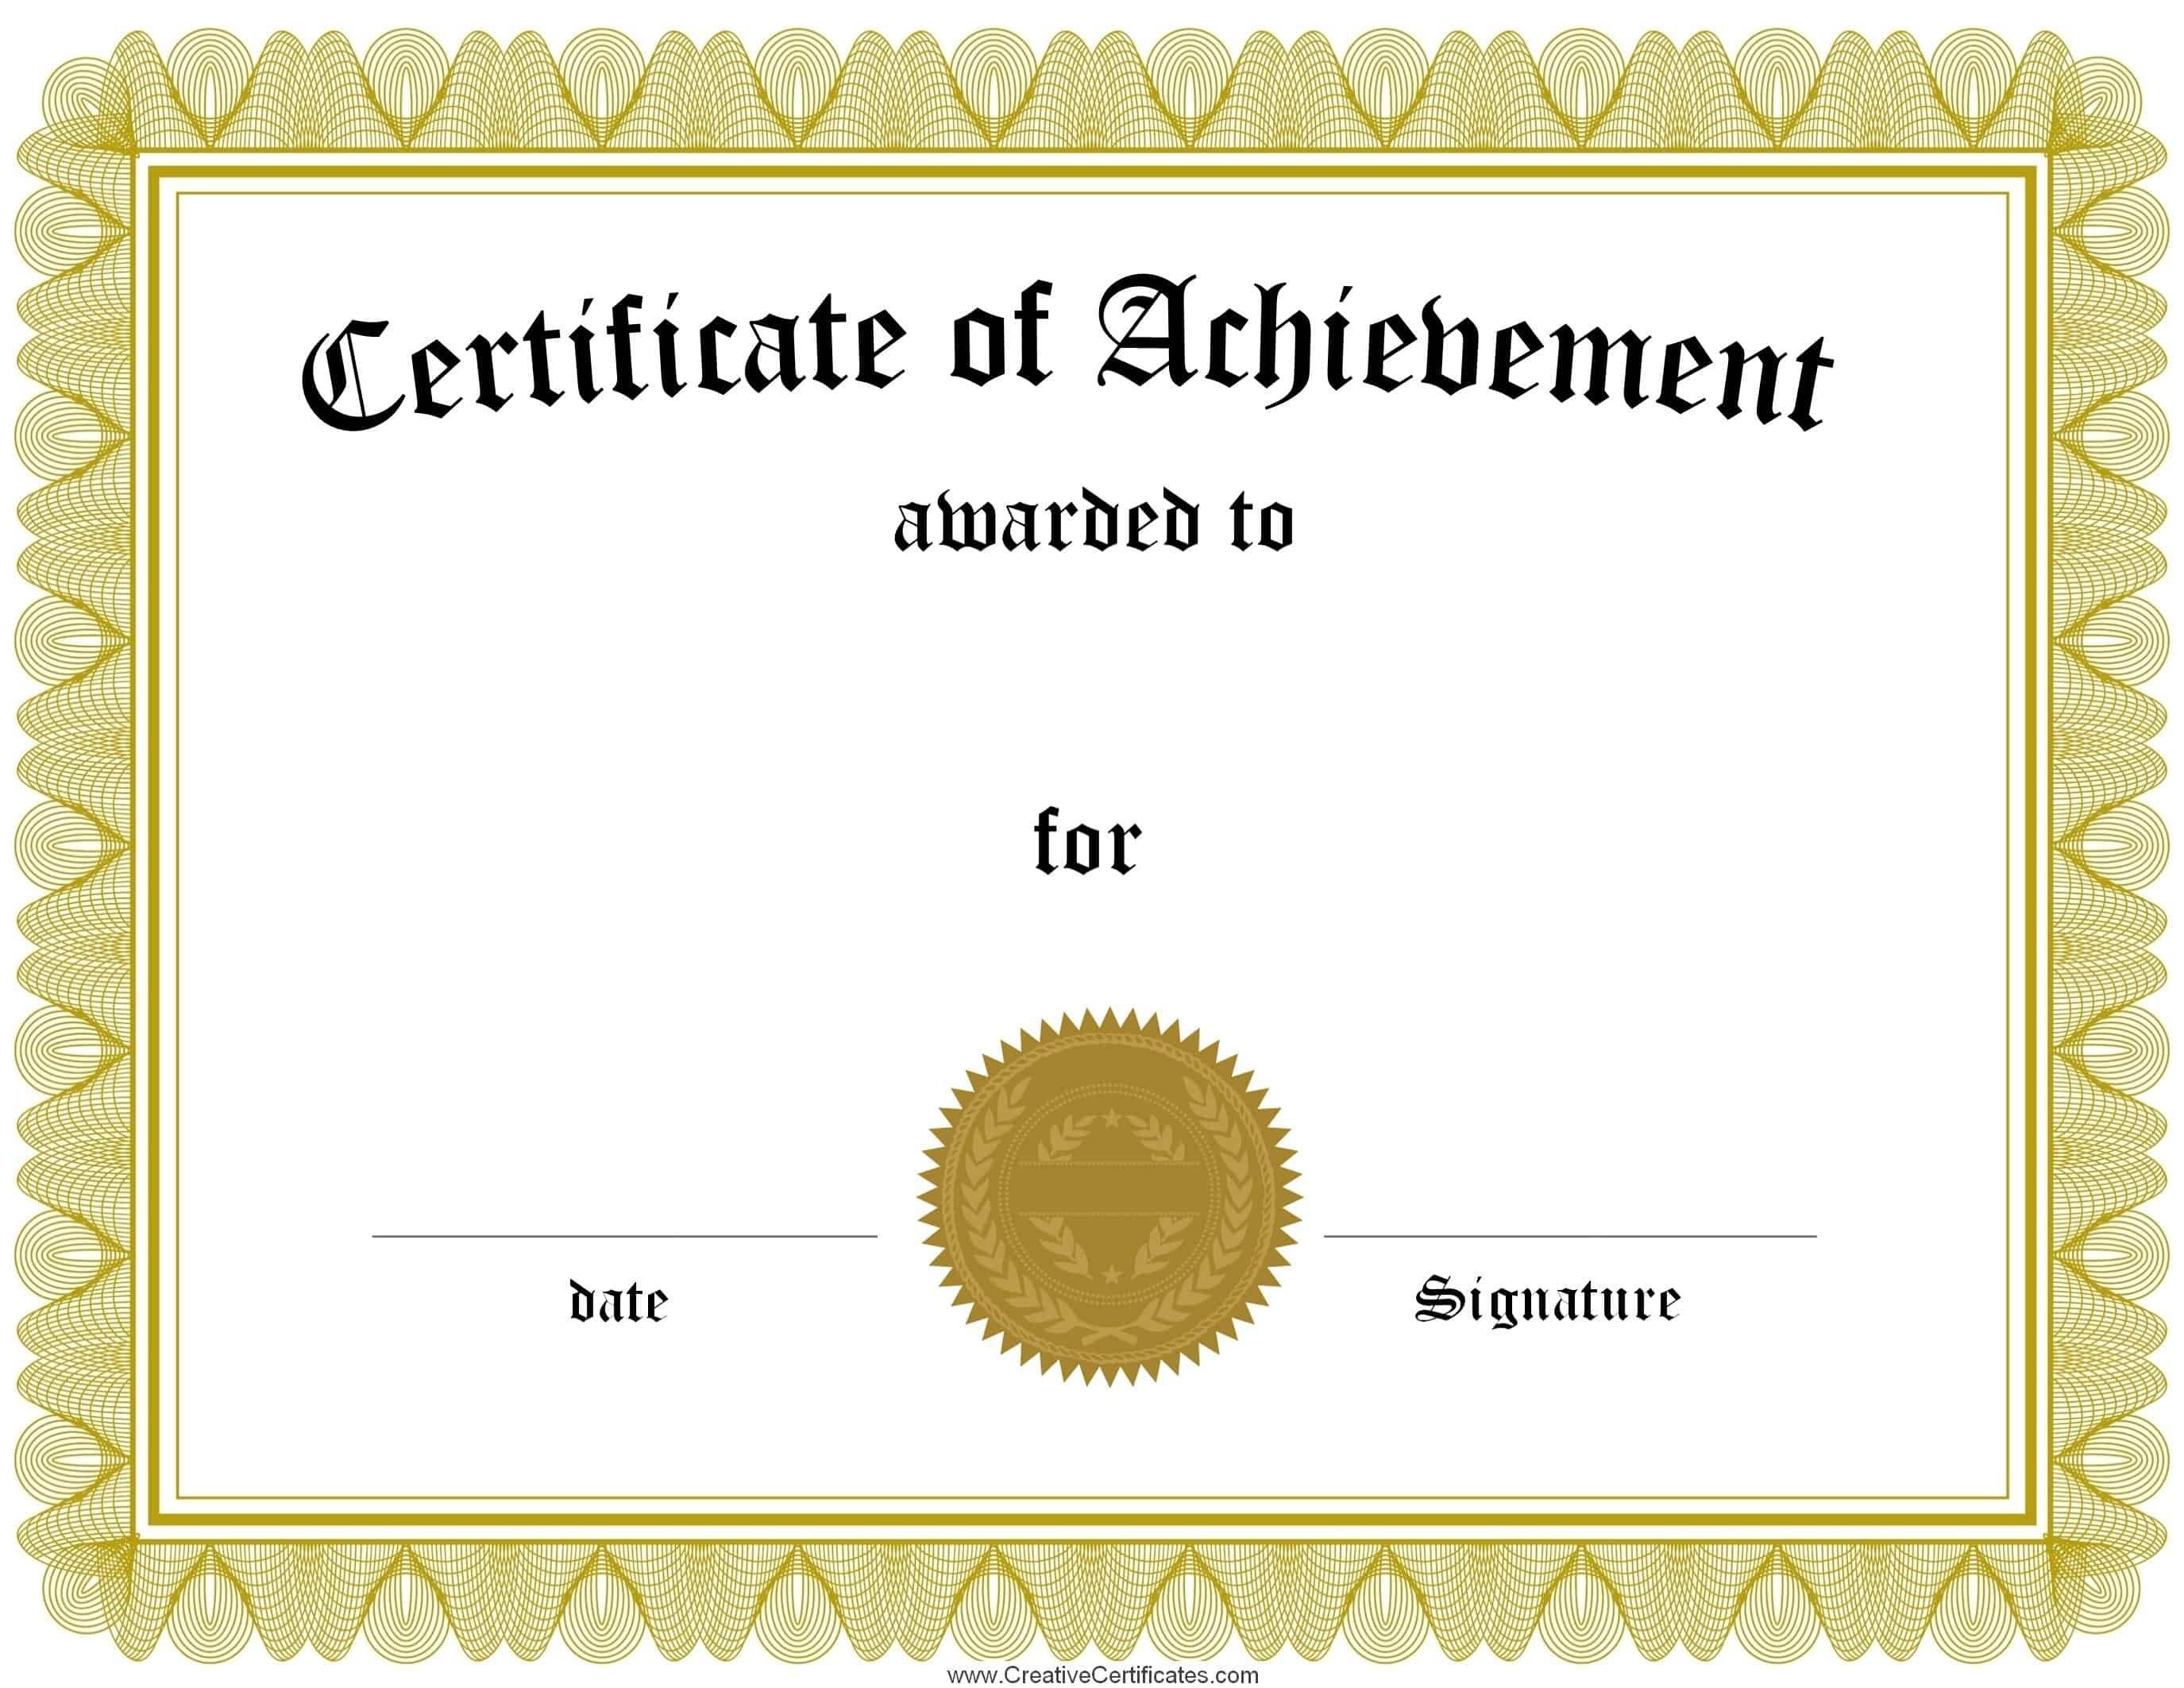 Free Customizable Certificate Of Achievement Within Free Certificate Of Excellence Template